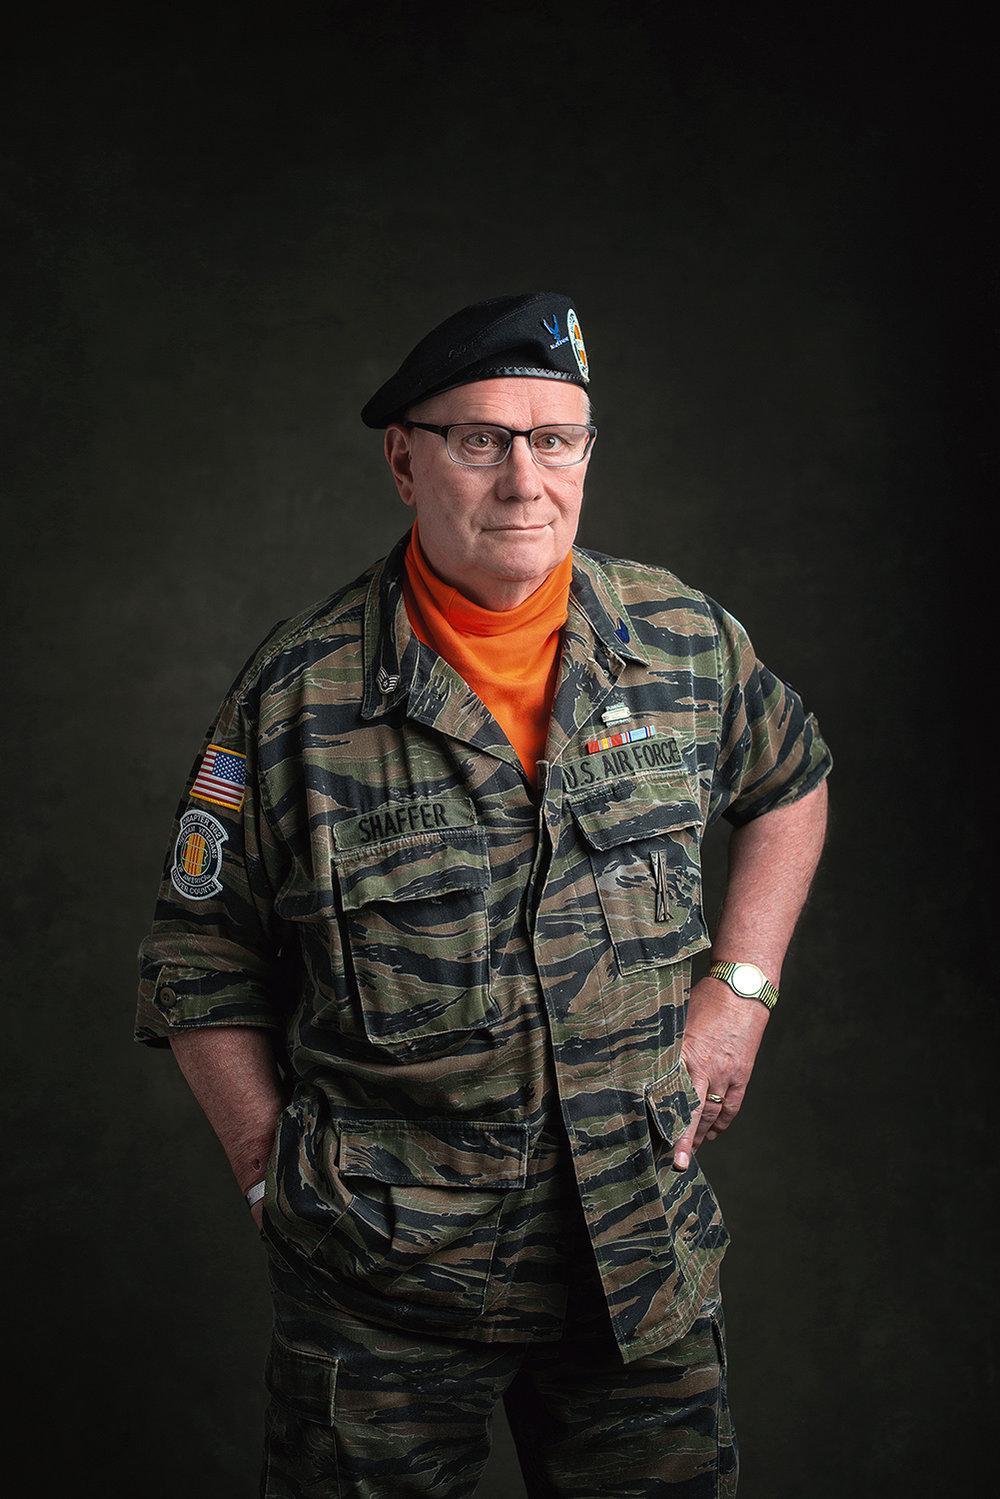 Gary B. Shaffer